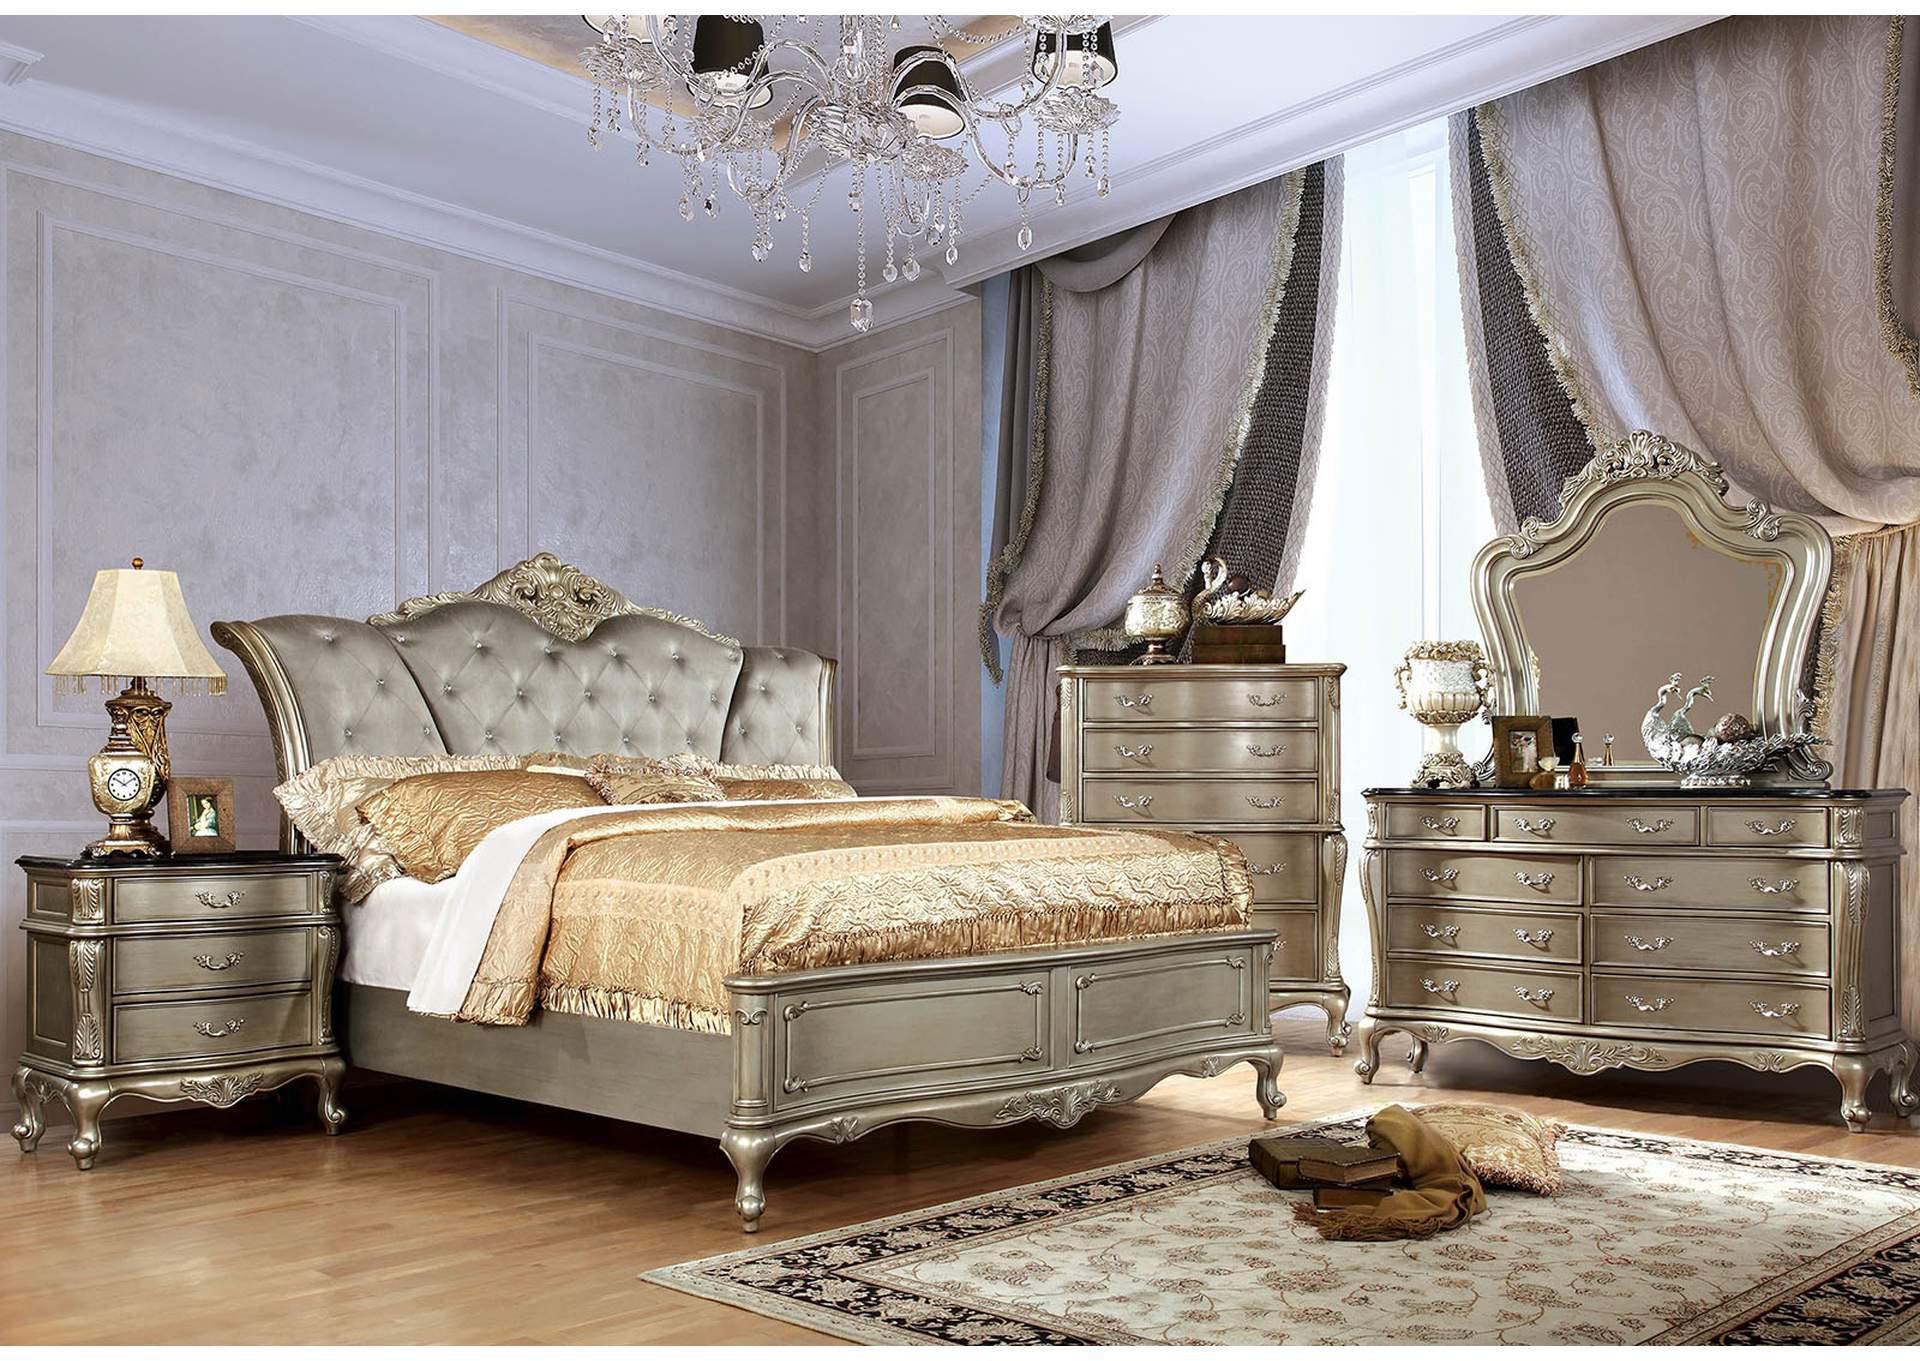 Humble furniture decor johara gold upholstered platform for California king bed